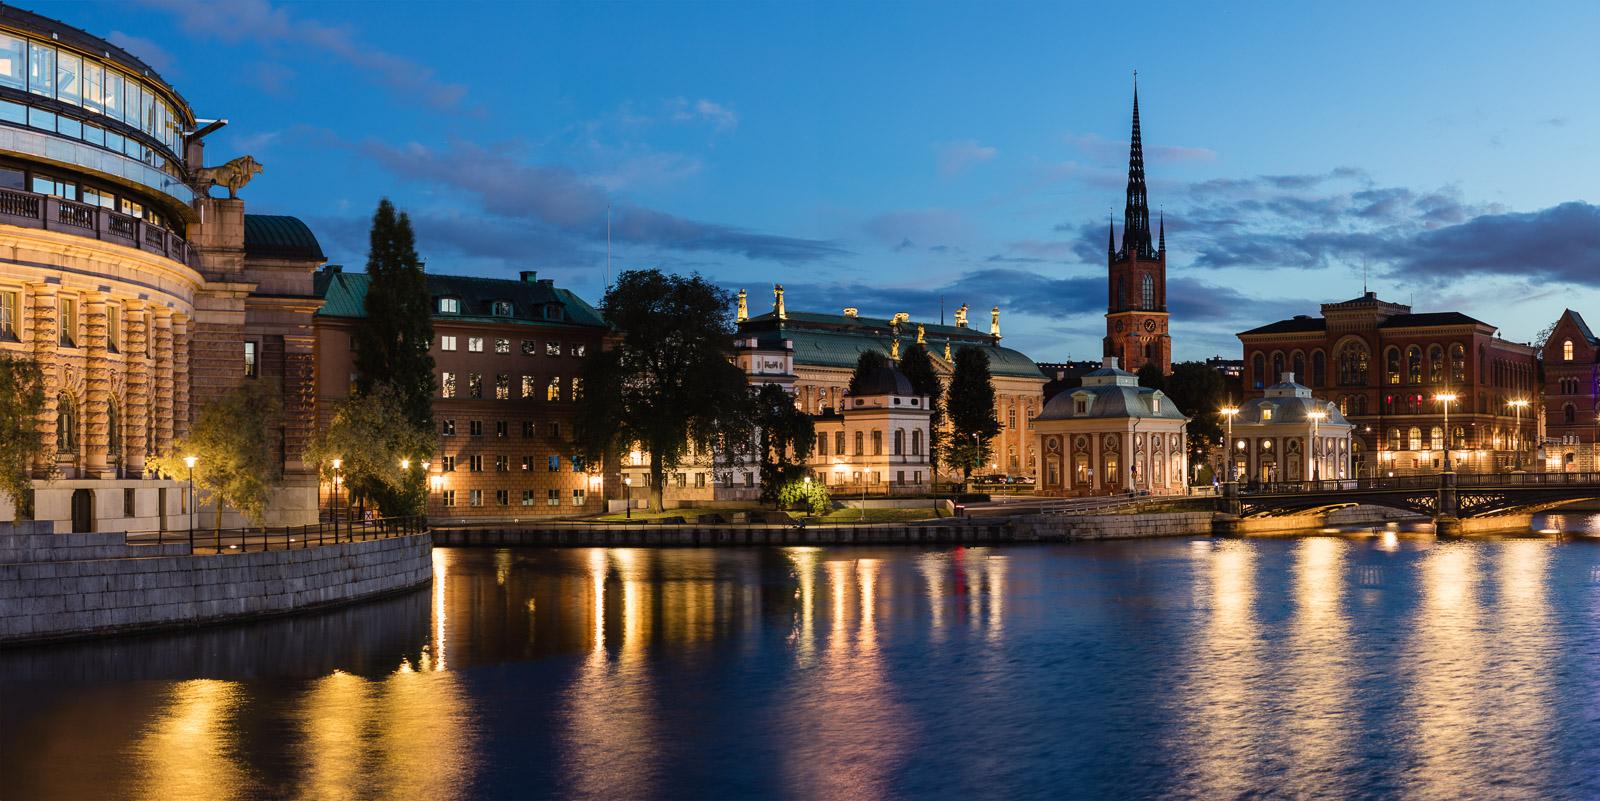 161002-stockholm-470-Pano-Edit.jpg